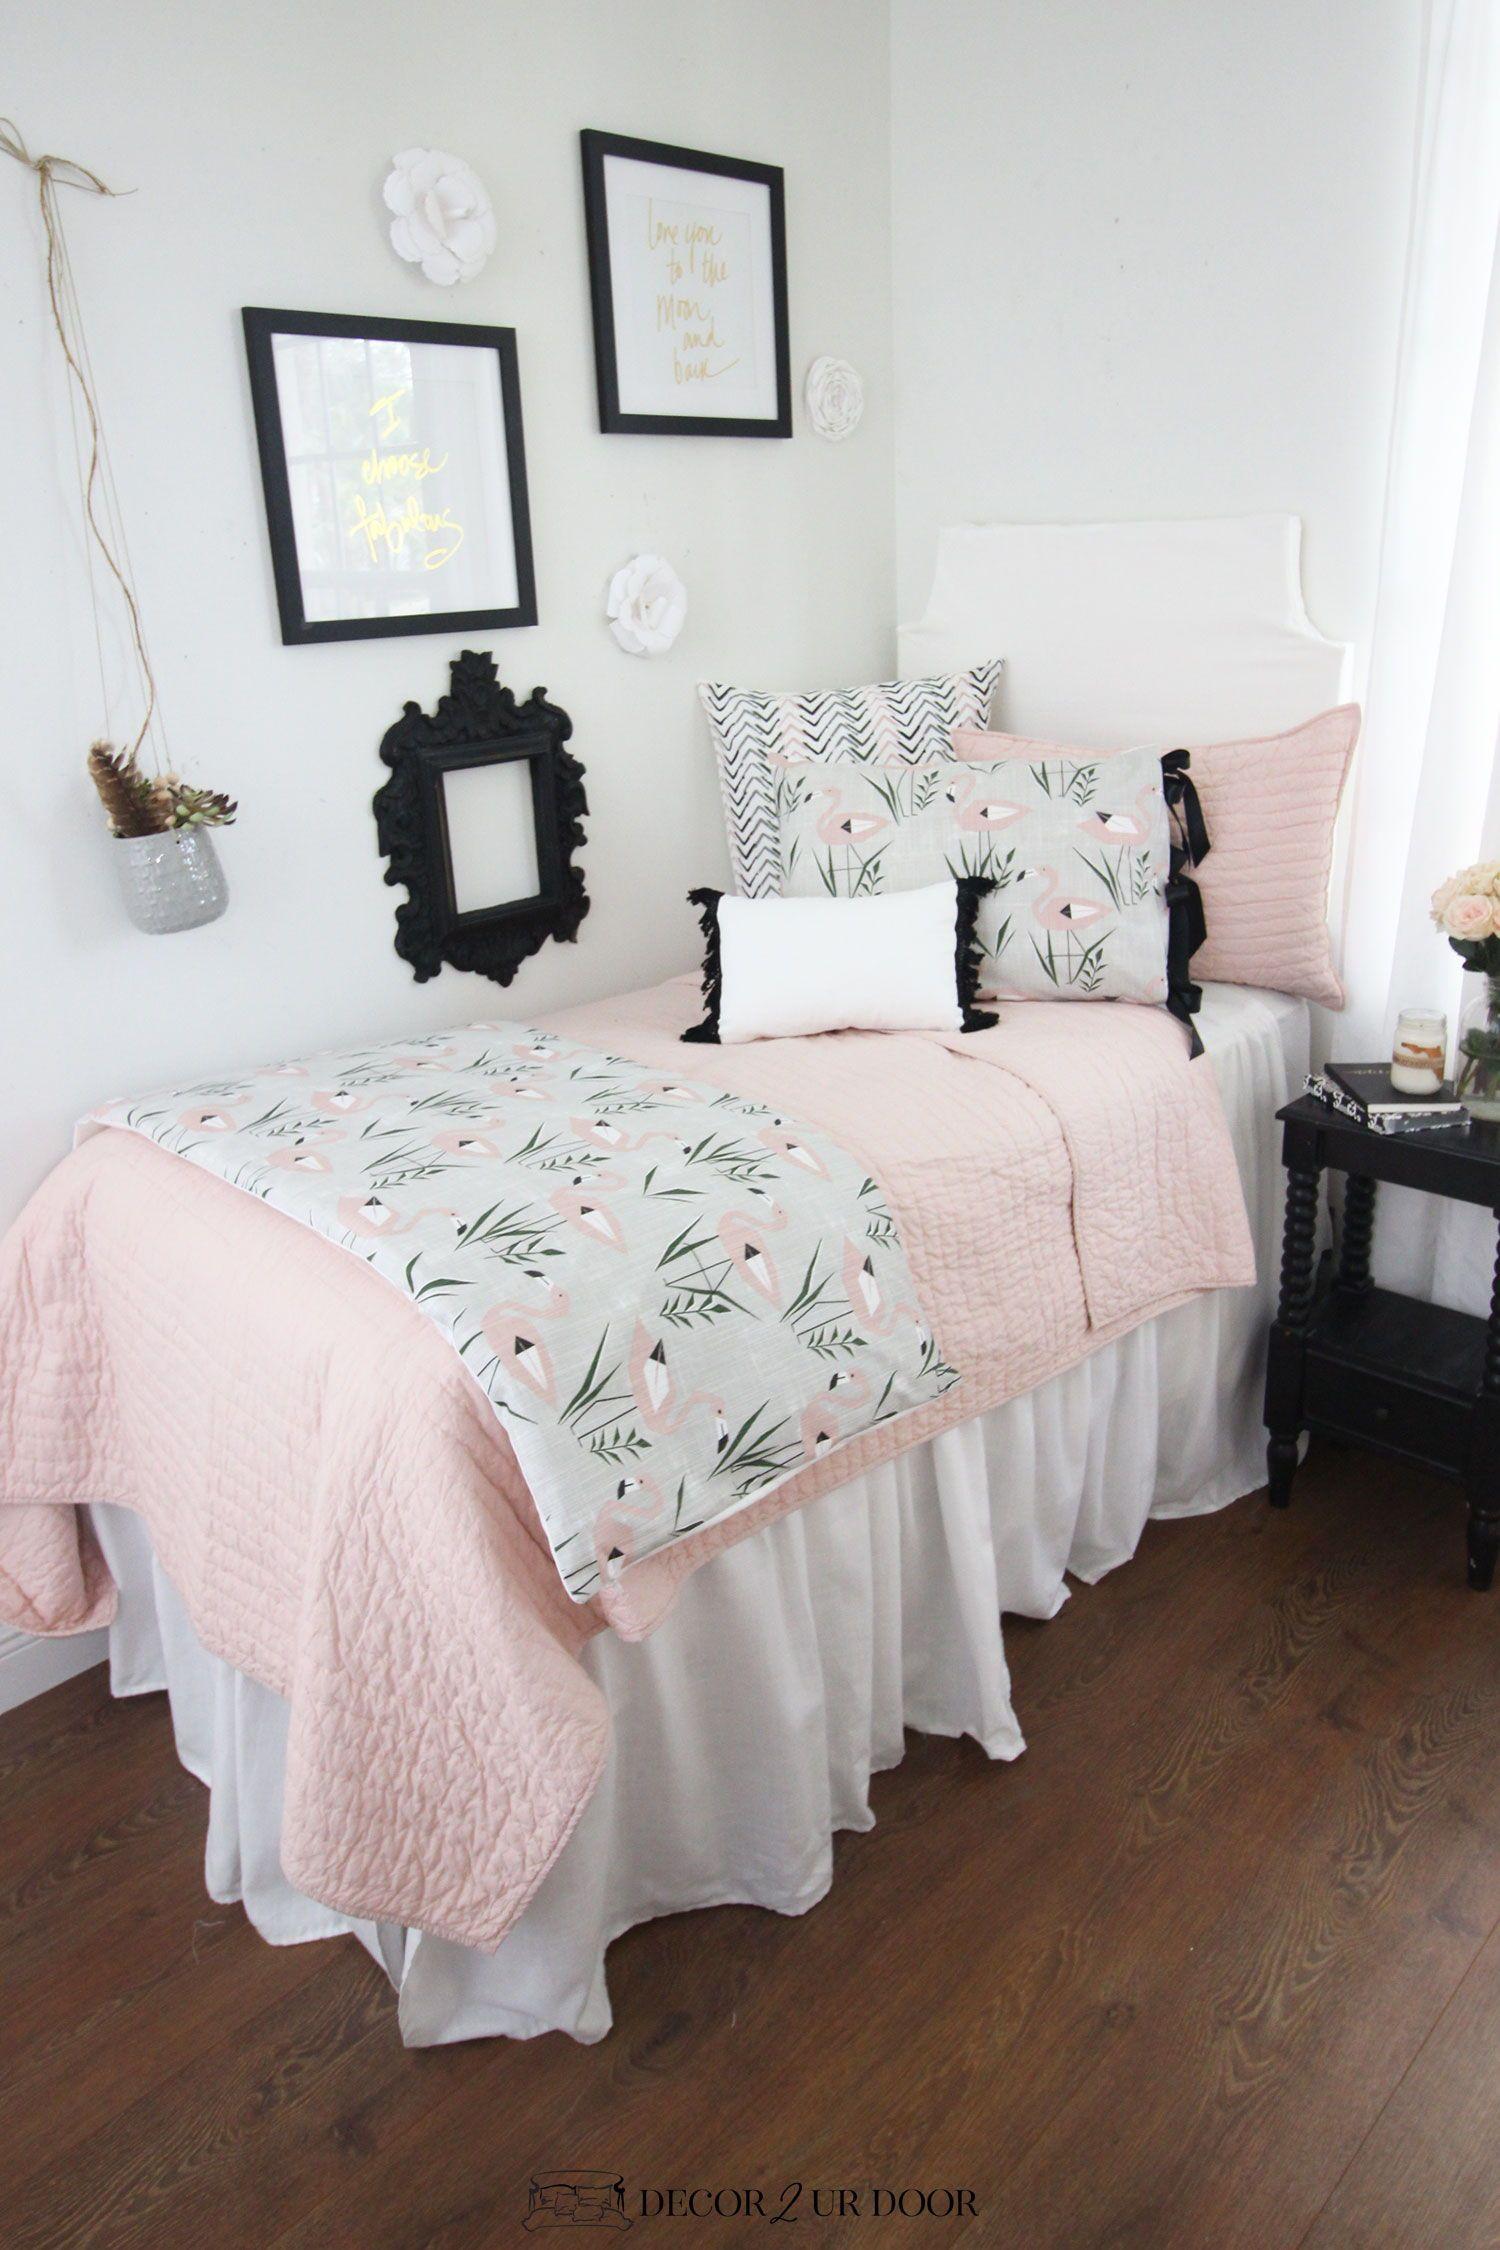 Dorm Room Furniture: Blush Pink Dorm Room Ideas And Inspiration